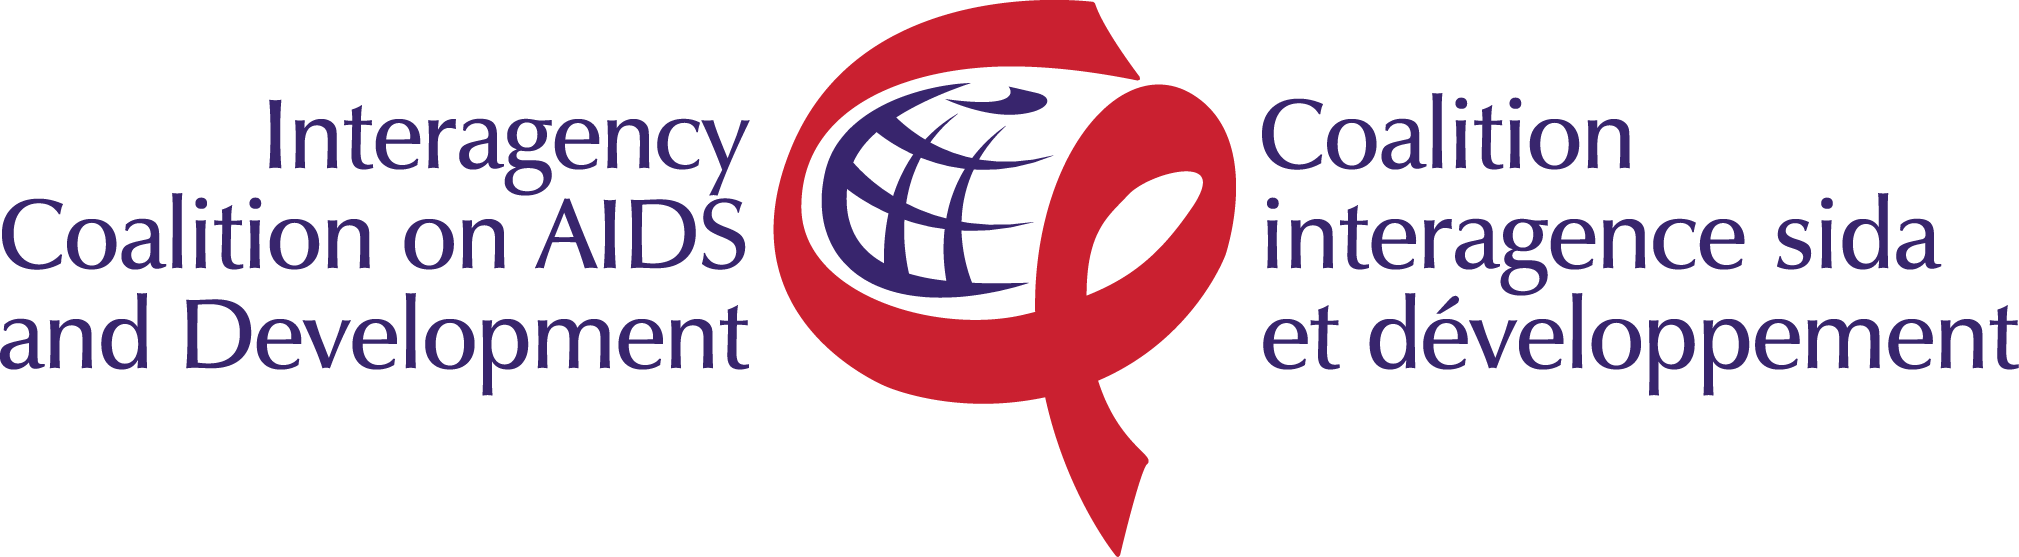 Coalition interagence sida et développement (CISD) - Logo